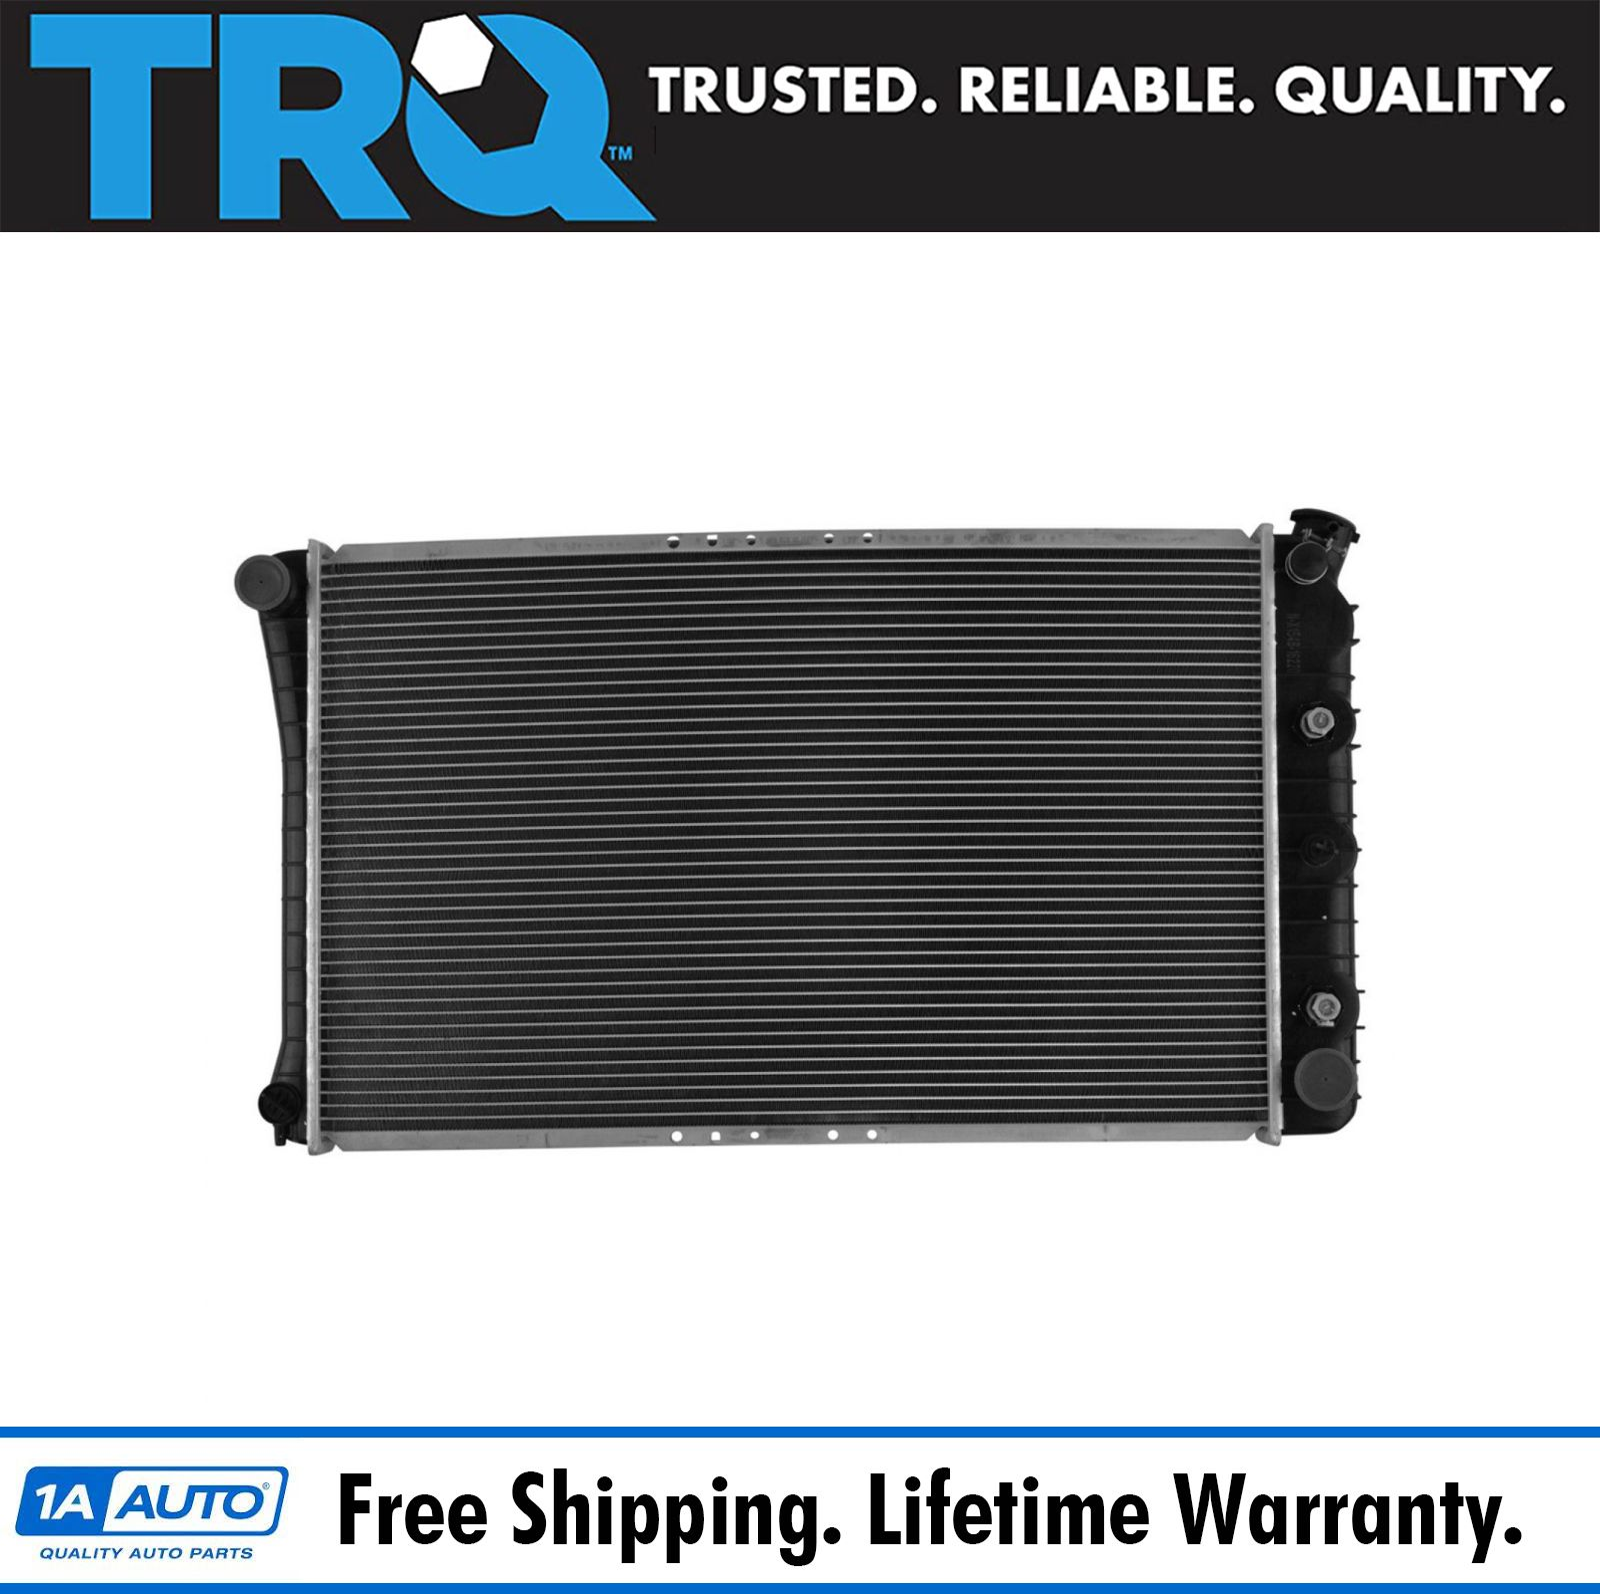 Radiator Assembly Plastic Tanks Aluminum Core for Chevy Buick Pontiac Oldsmobile